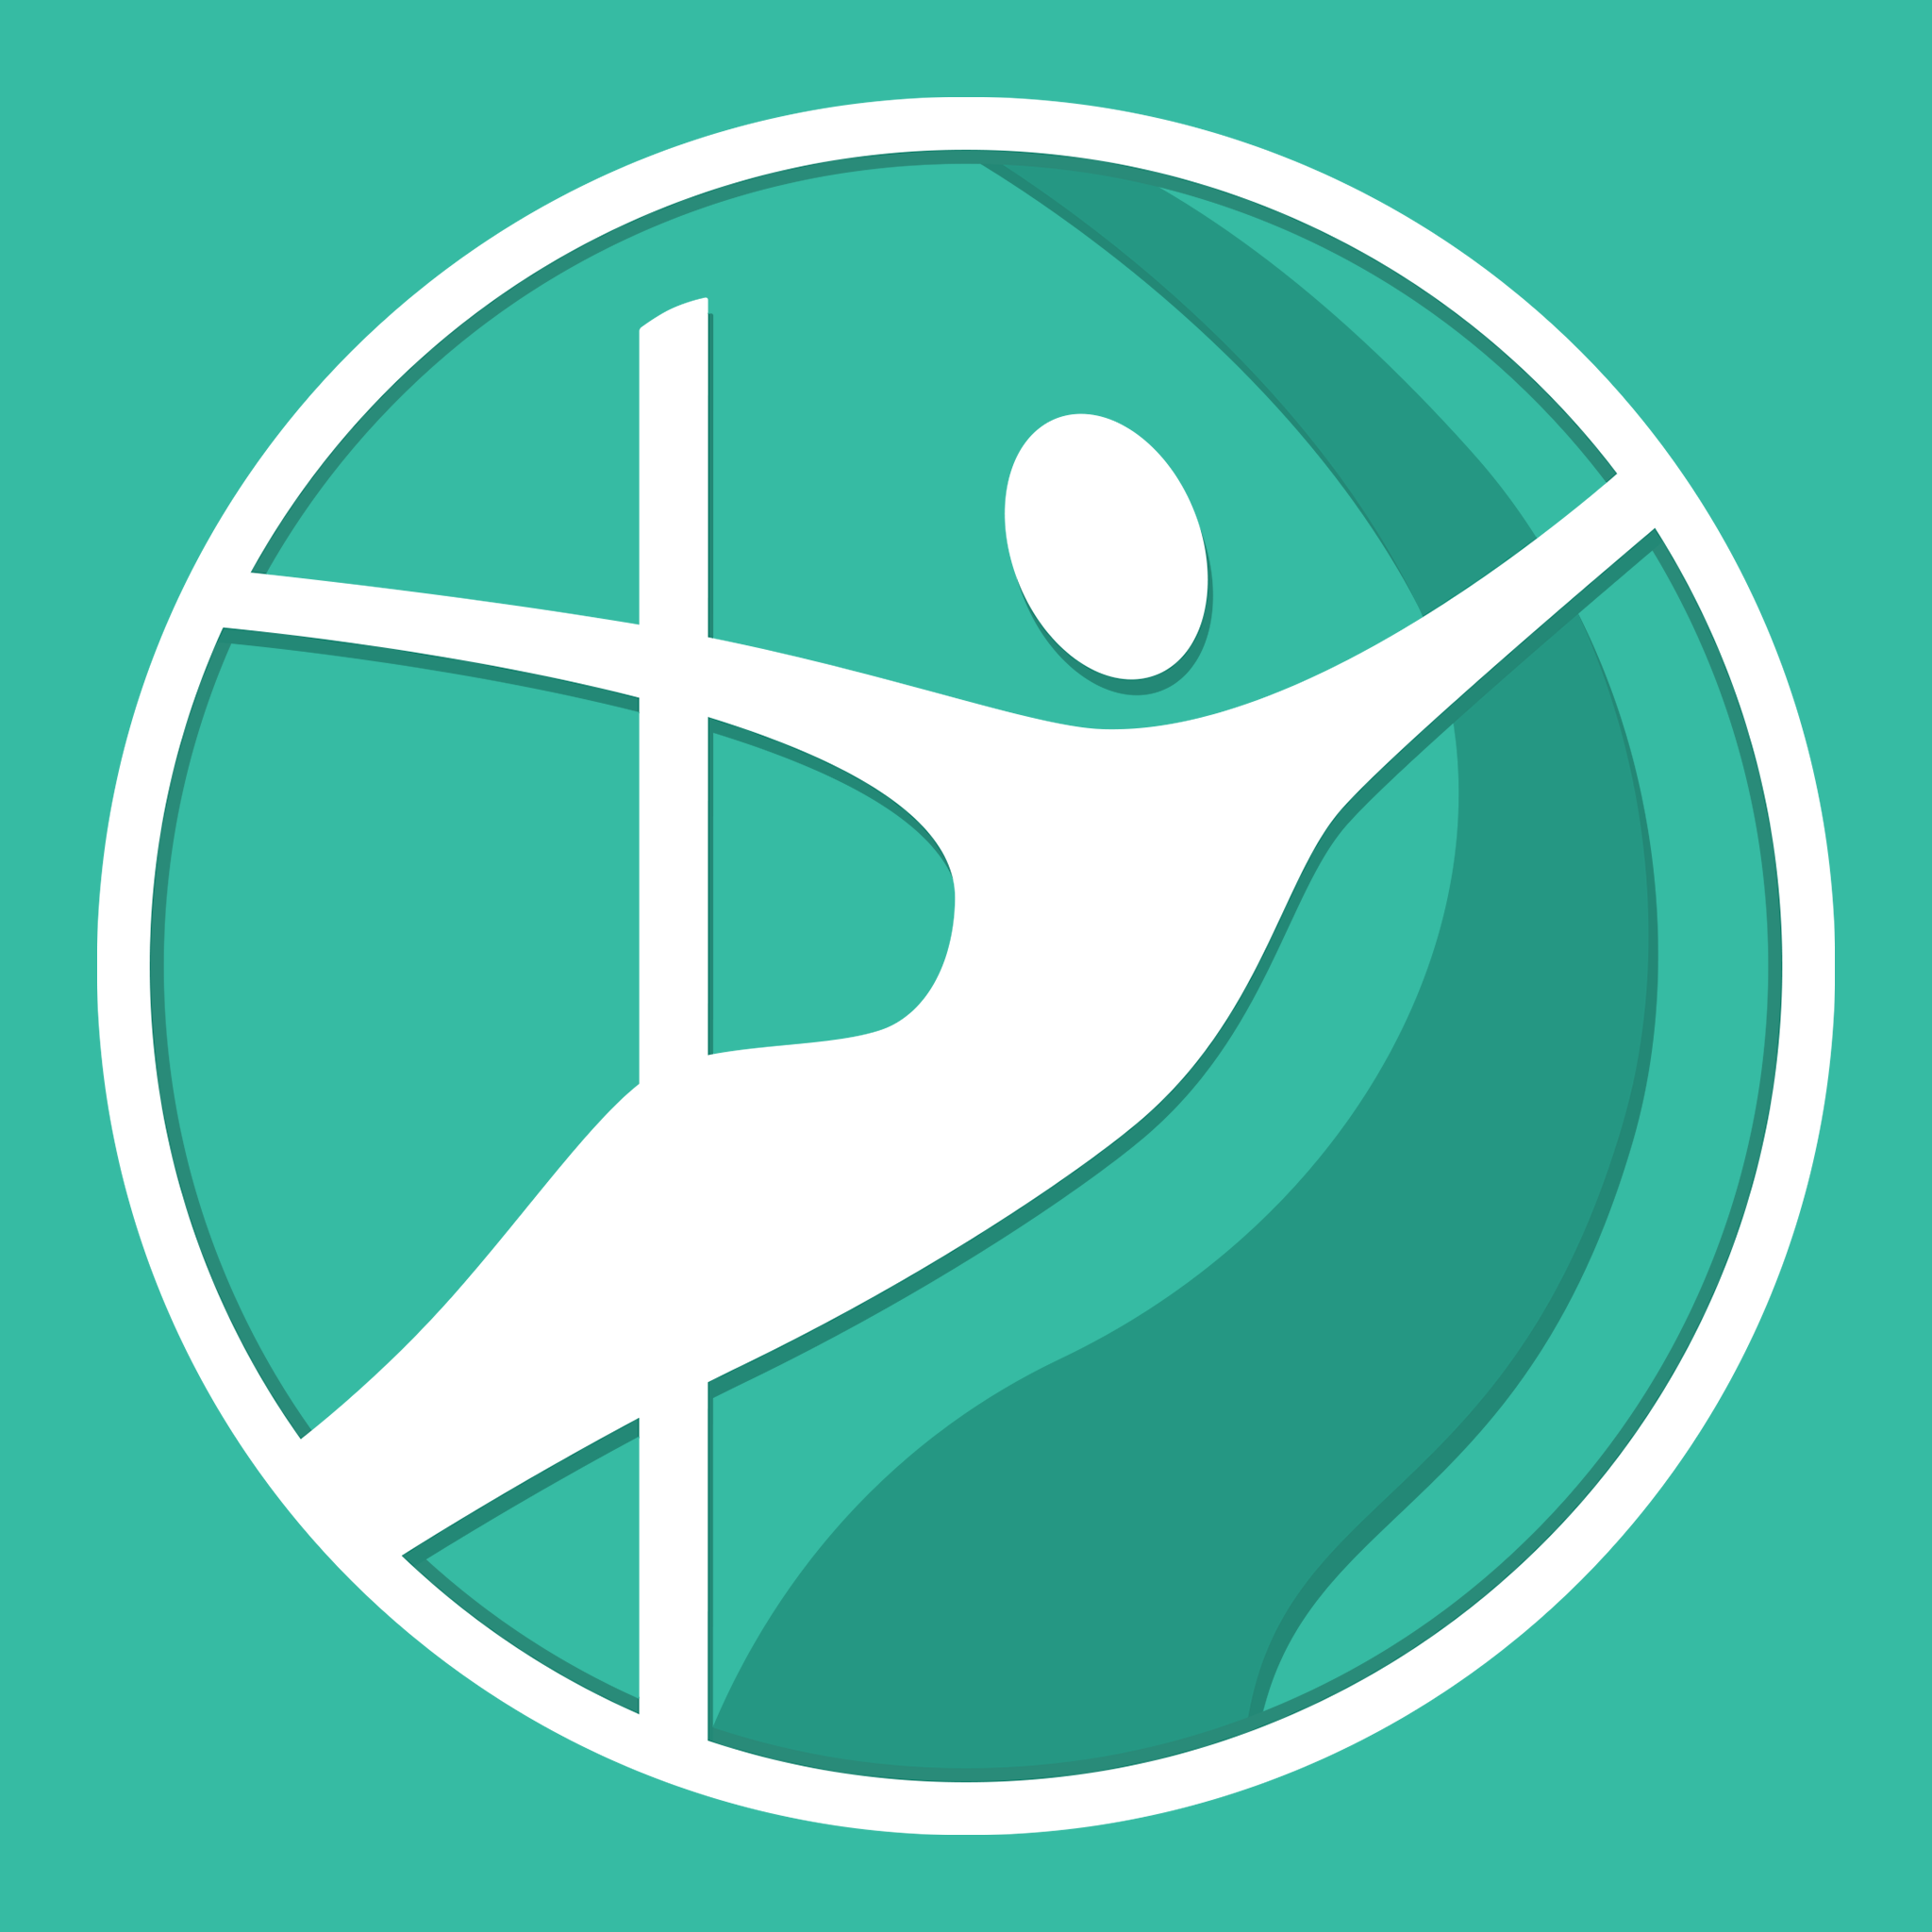 Polearn - Pole Dance Tutorials